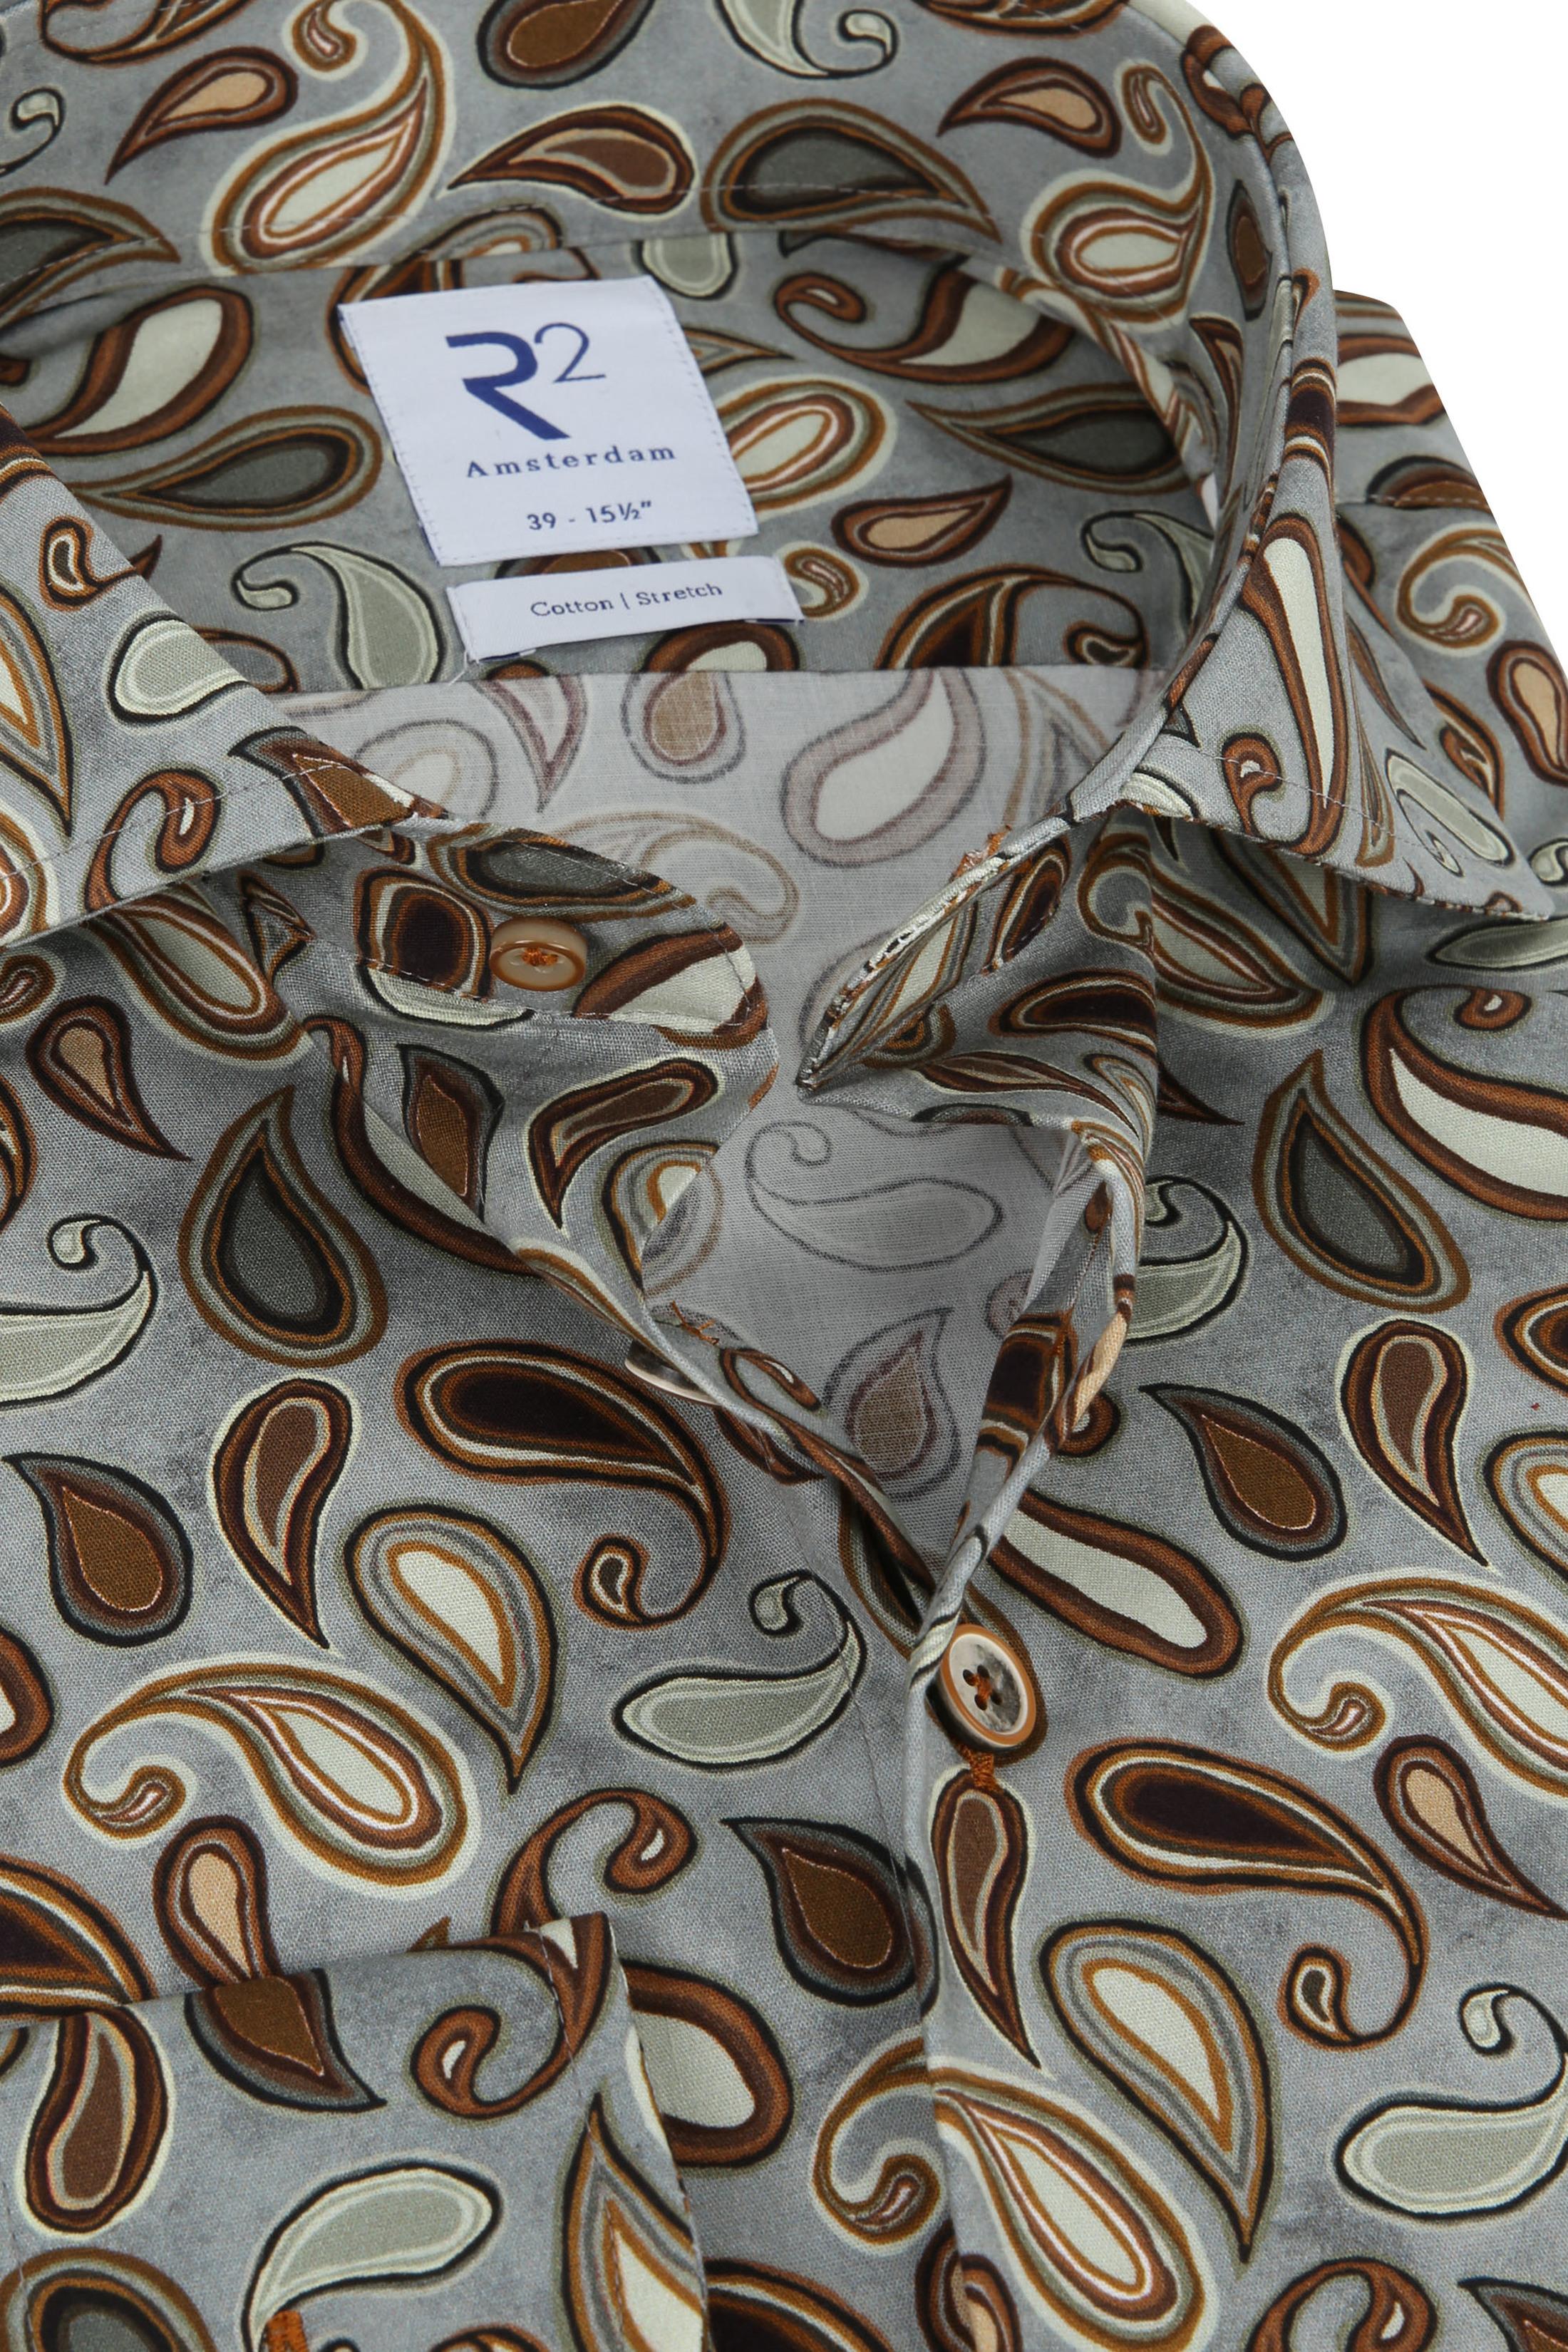 R2 Overhemd Grijs Paisly - Multicolour maat 43